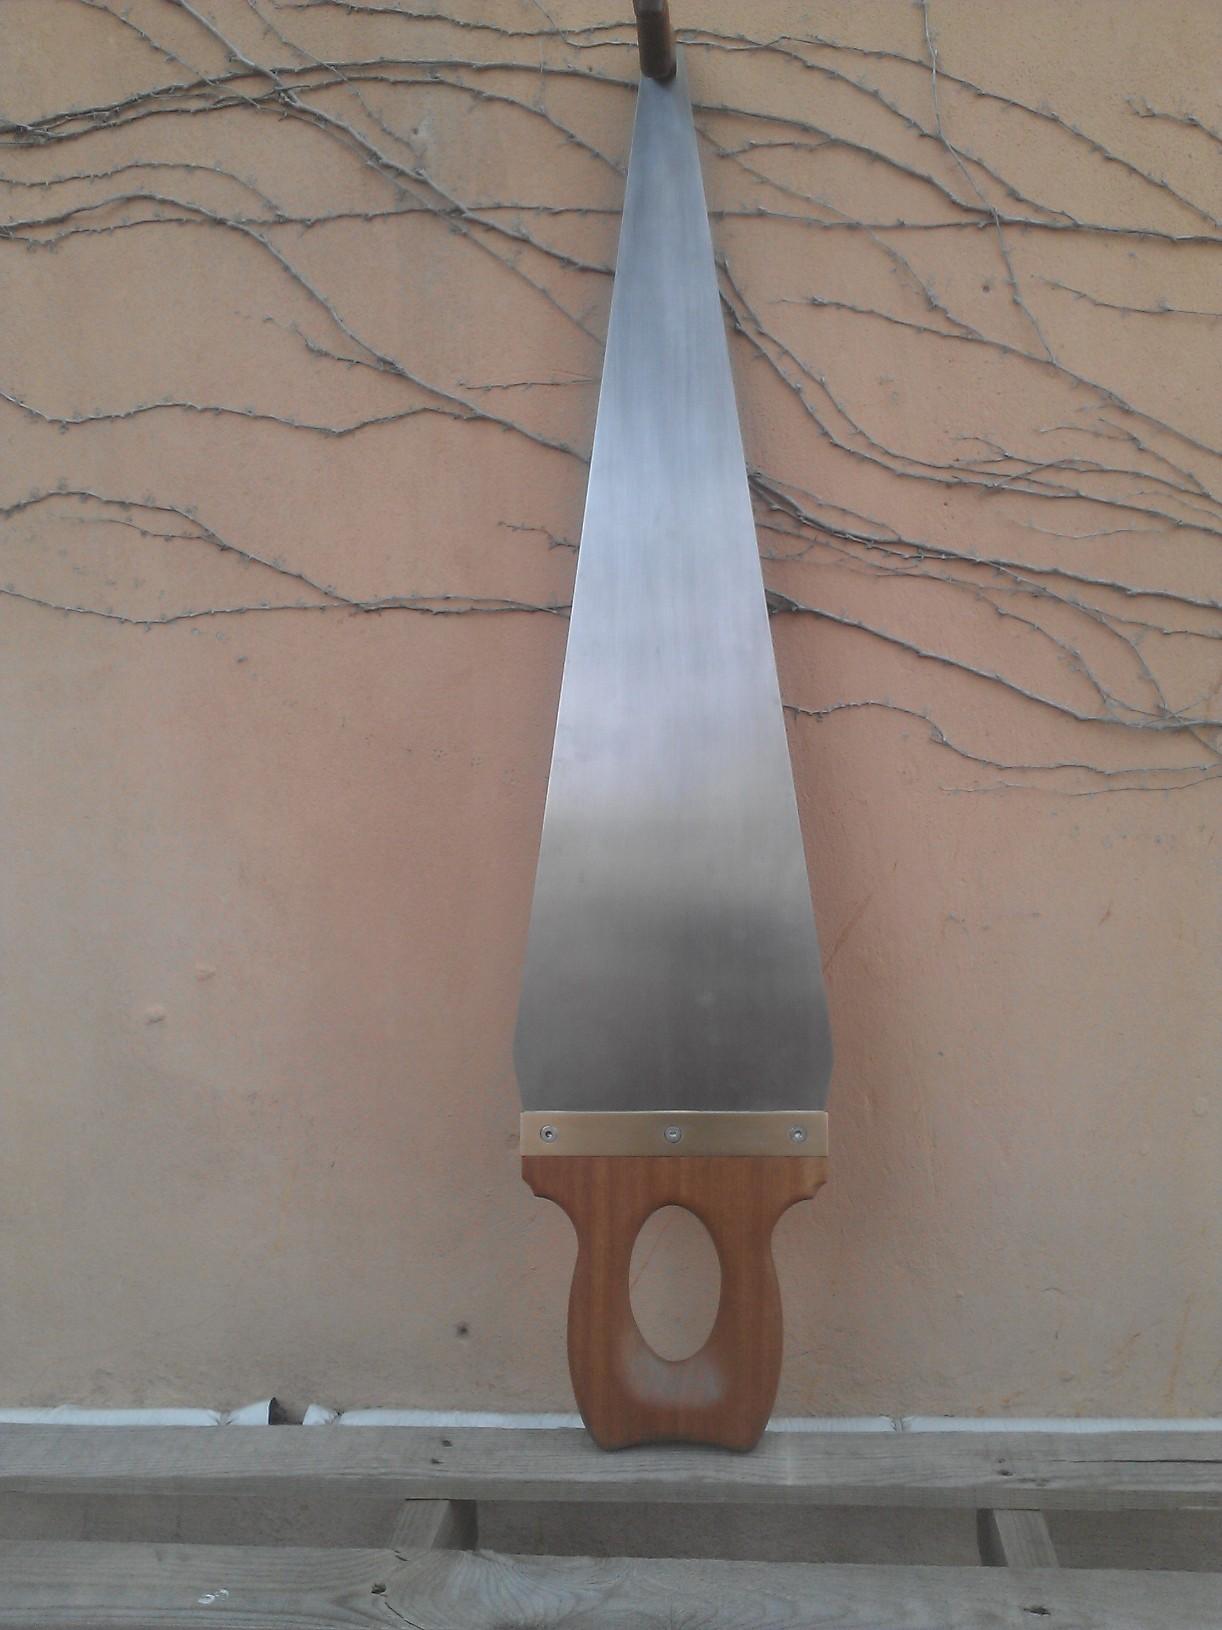 Baritone saw